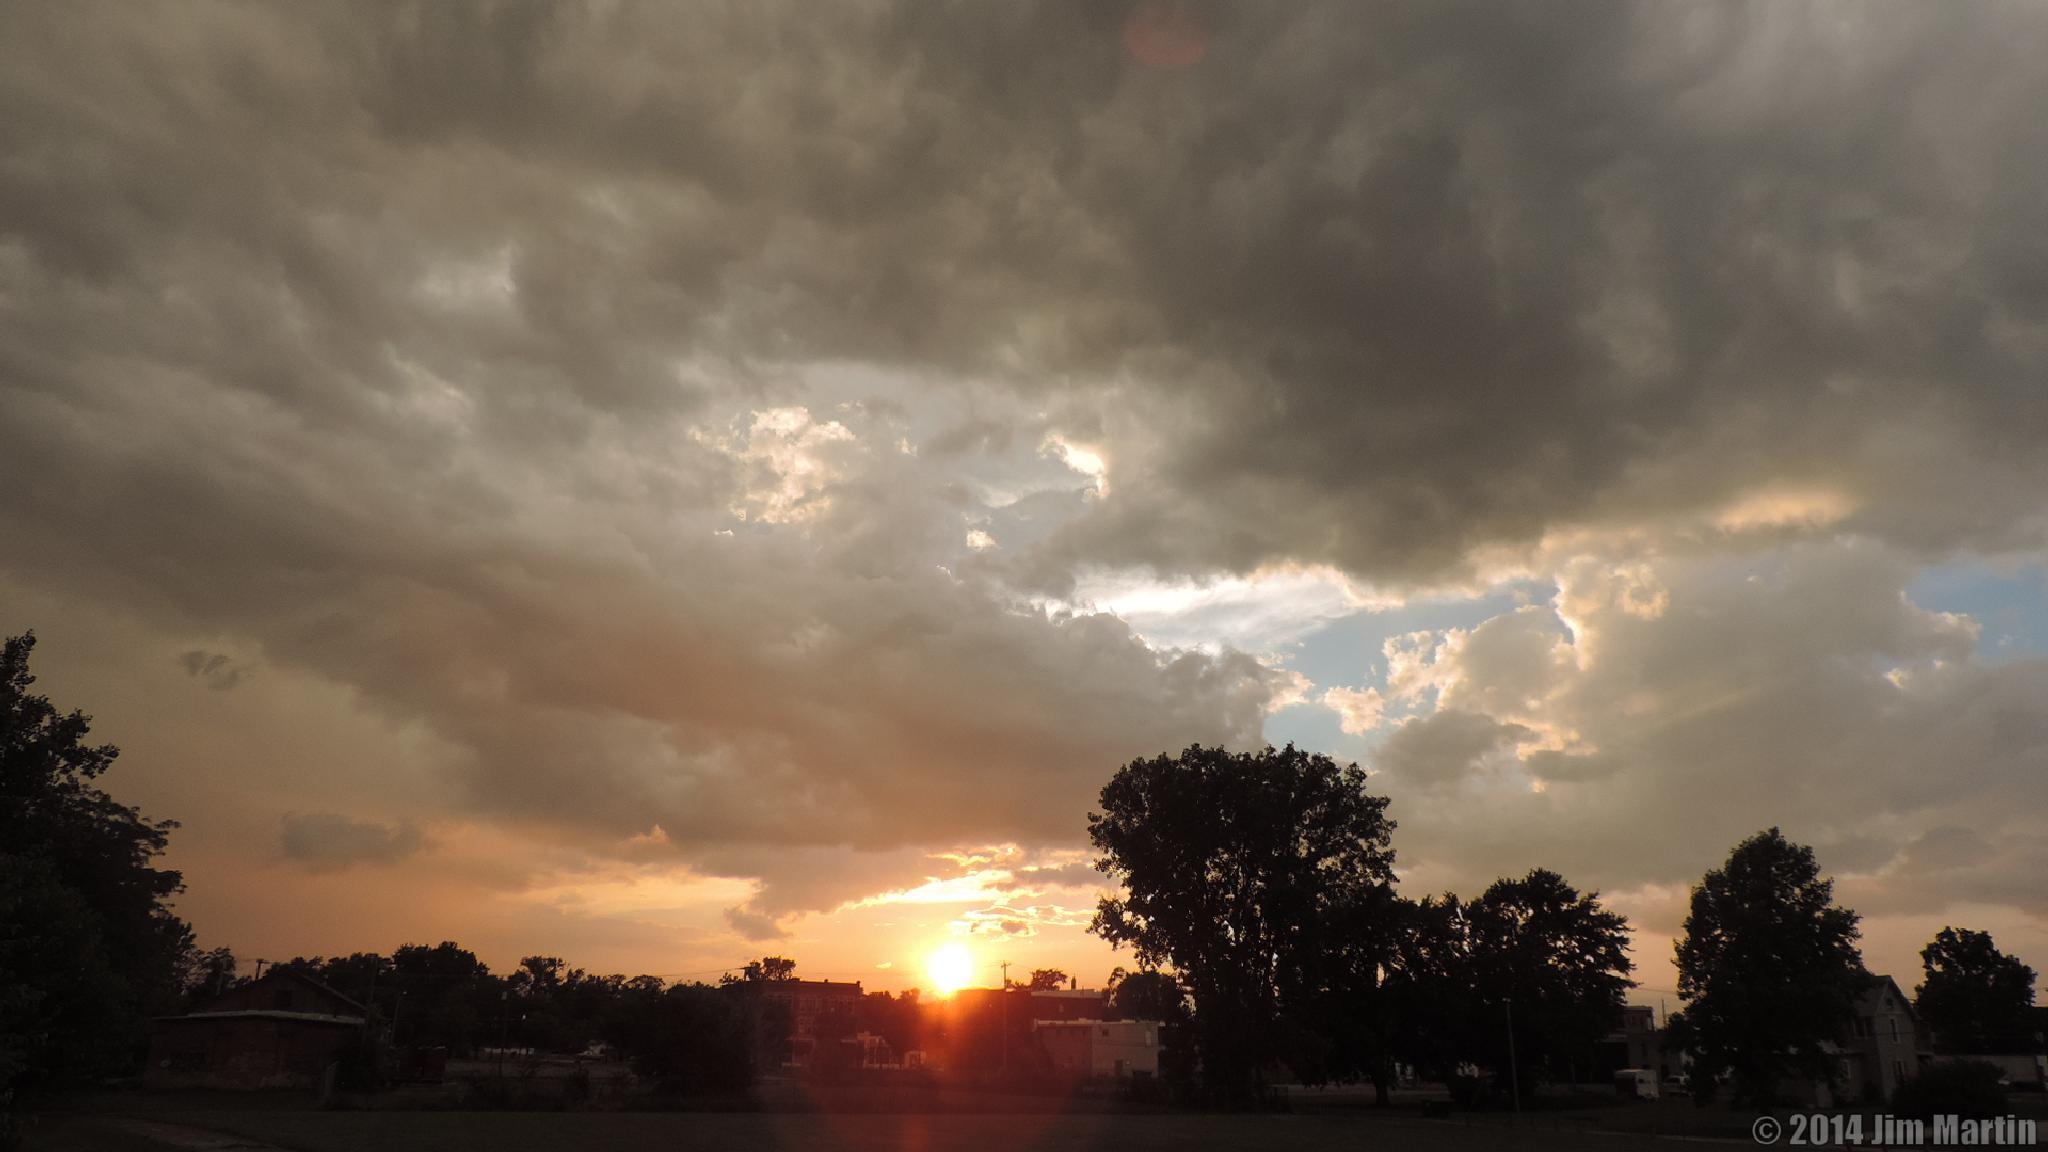 Sunset on the Boardwalk by Jim Martin